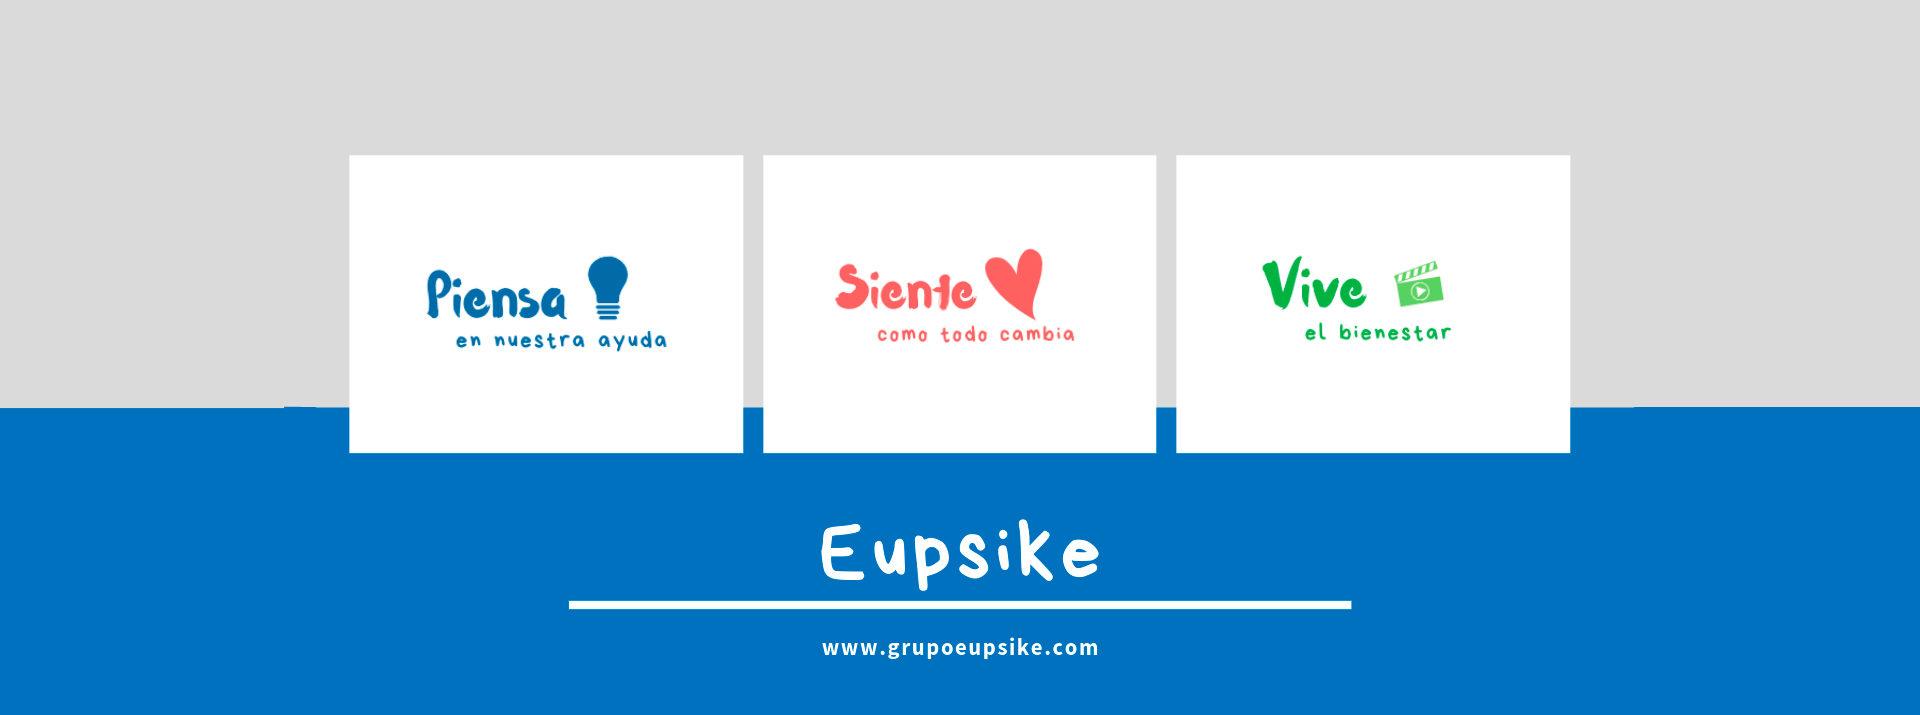 eupsike-psicologia